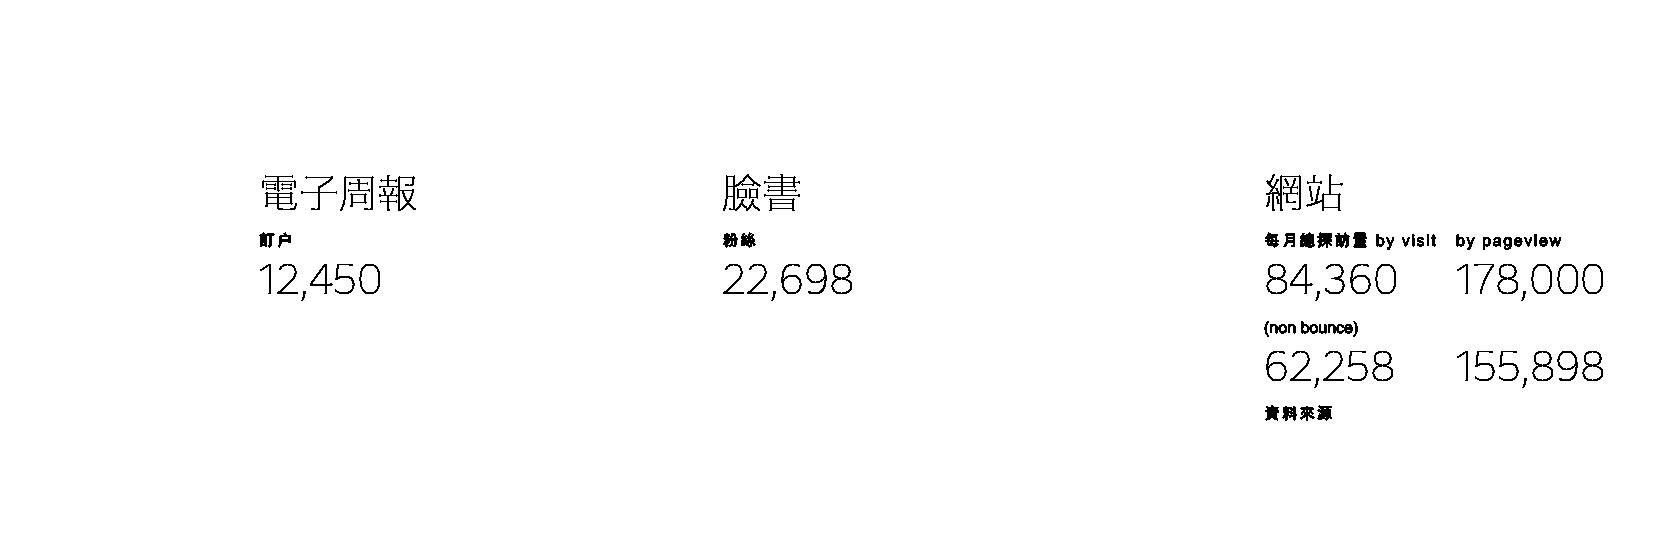 txt3.png